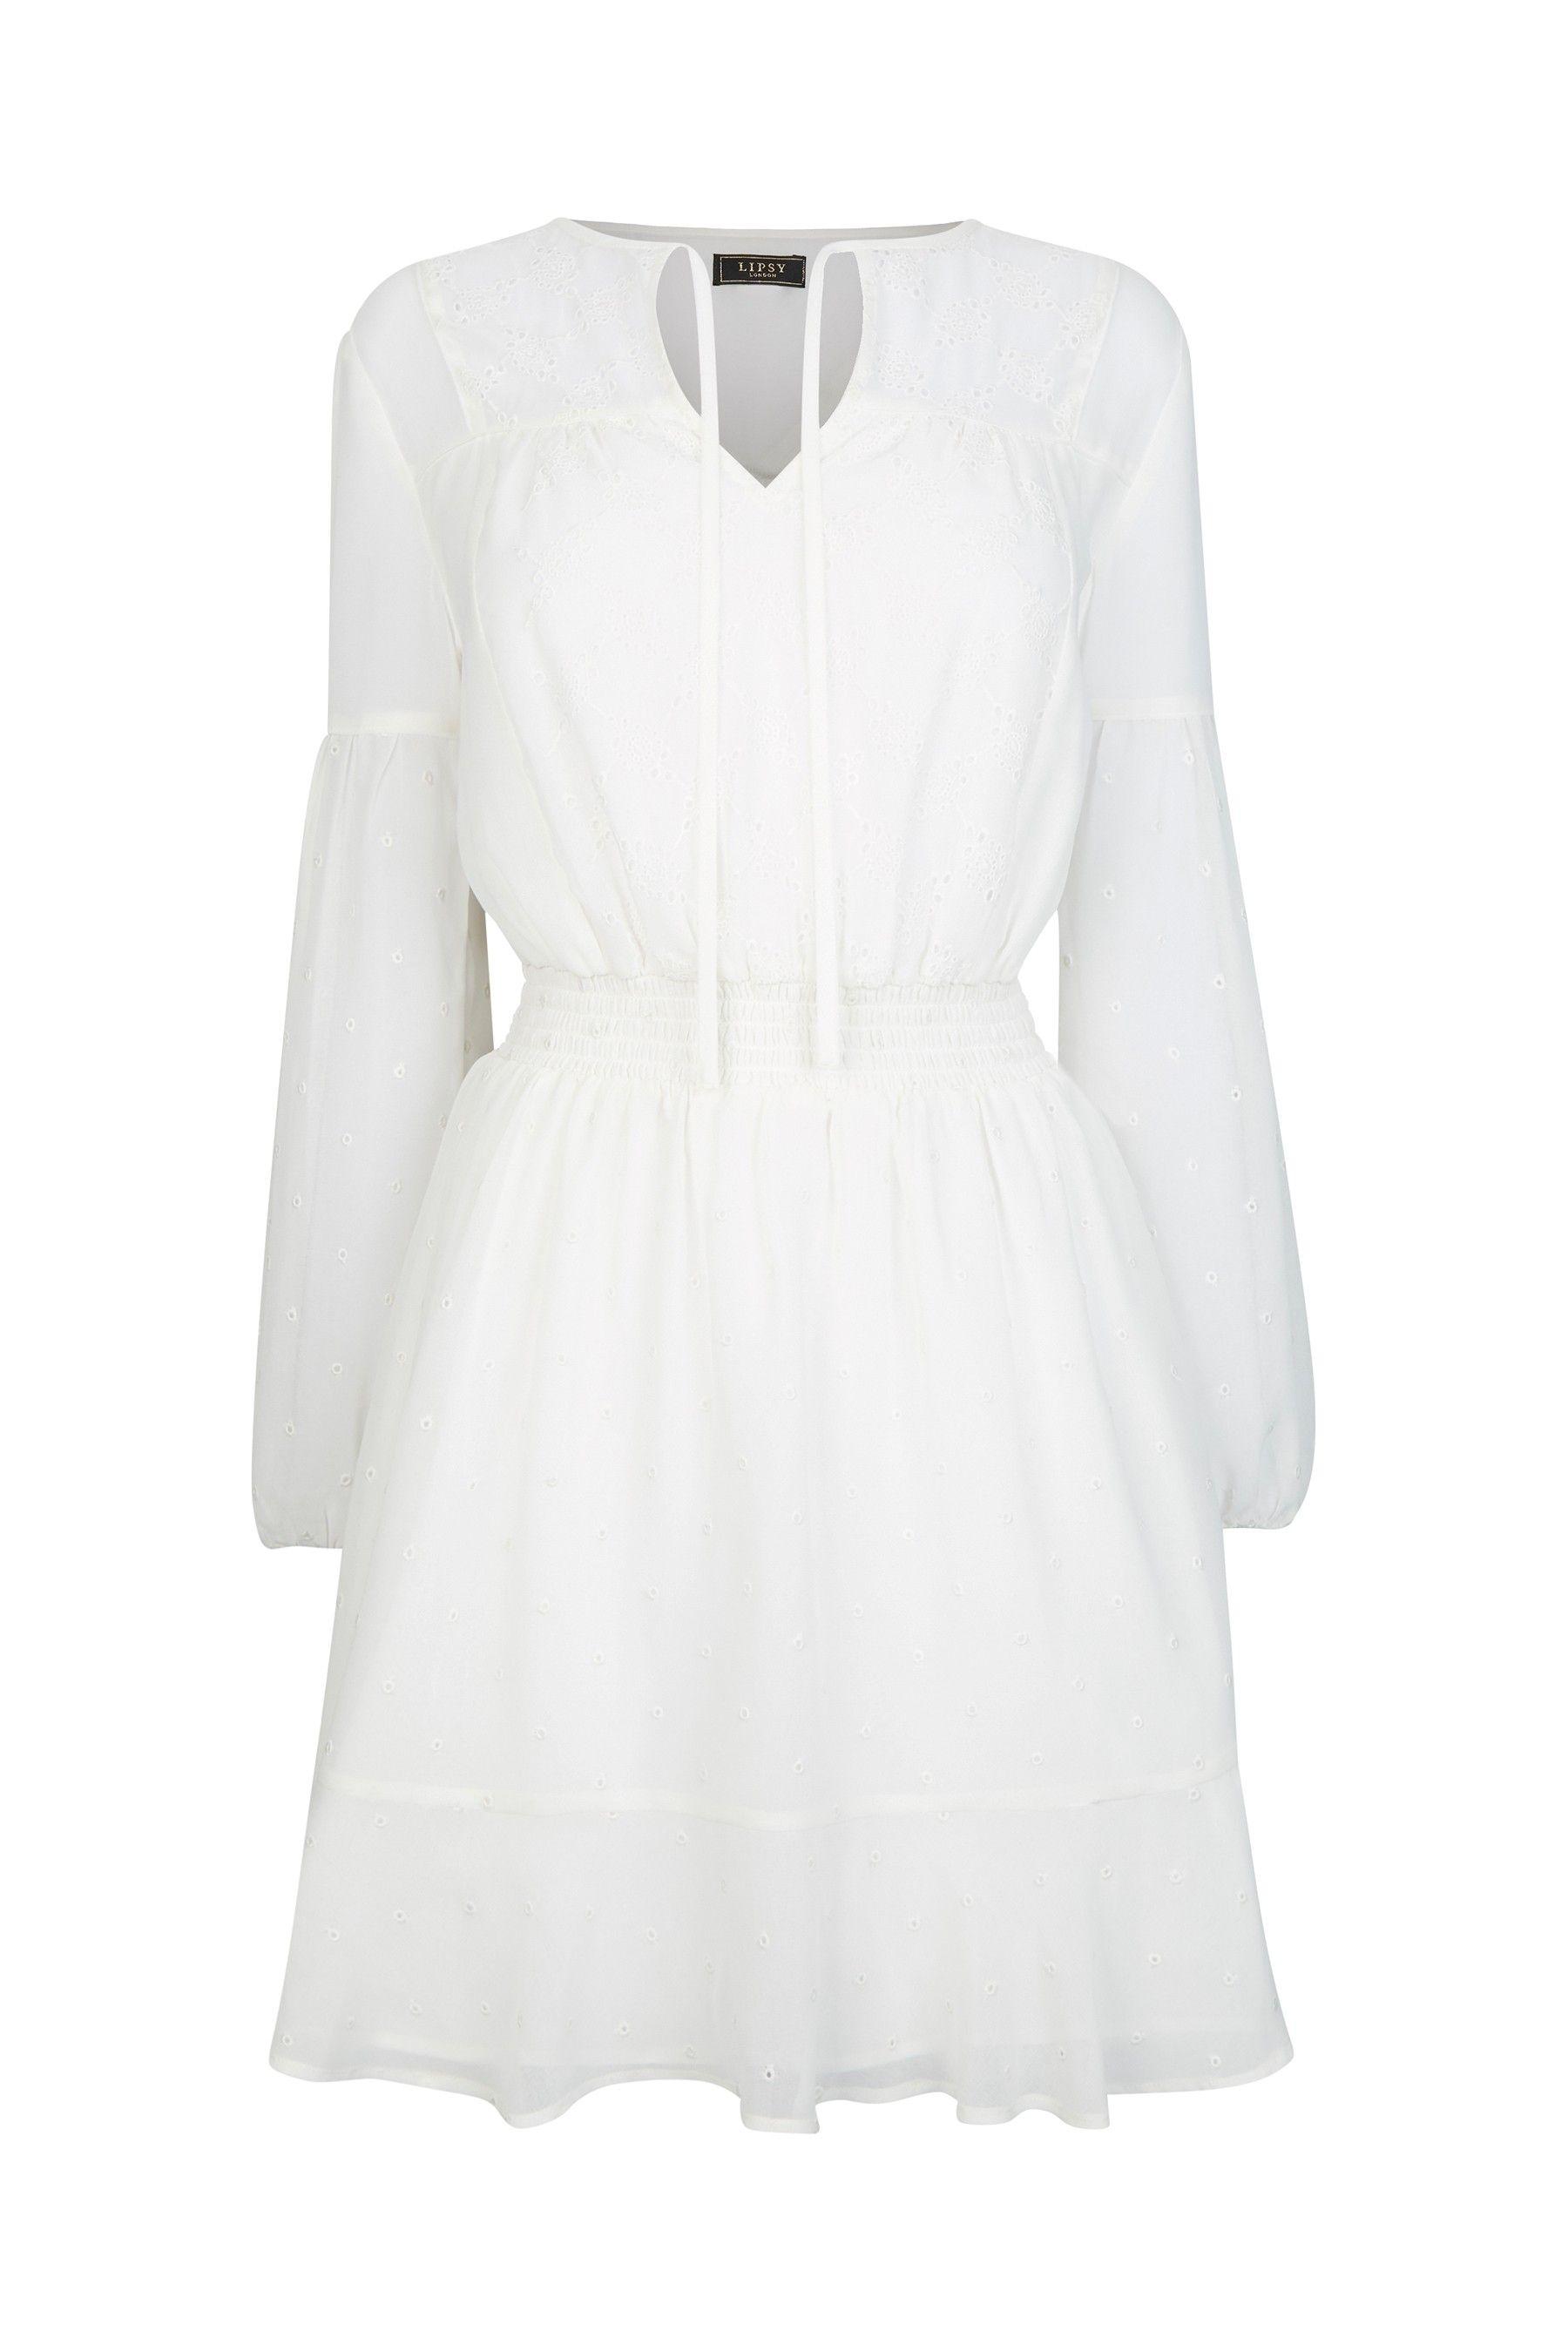 64e4973b62585 Womens Abbey Clancy x Lipsy Shirred Mini Dress - White in 2019 ...